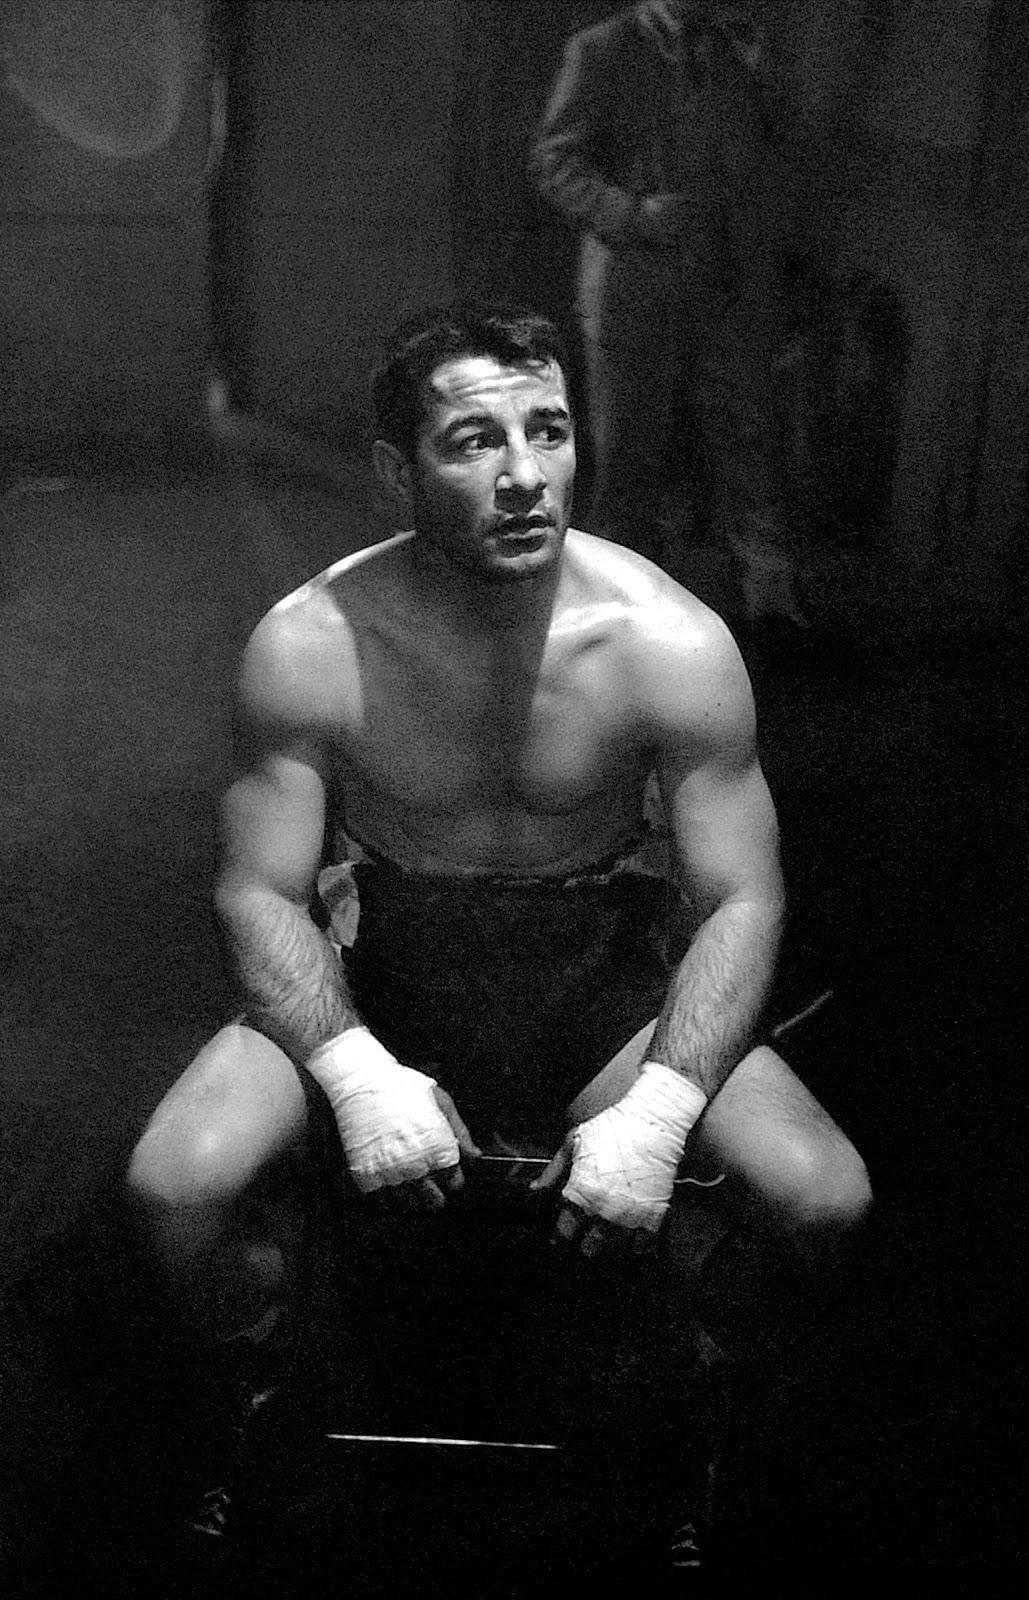 Rocky Graziano Middleweight Champion Boxer Portrait Taken By Director Stanley Kubrick In 1947